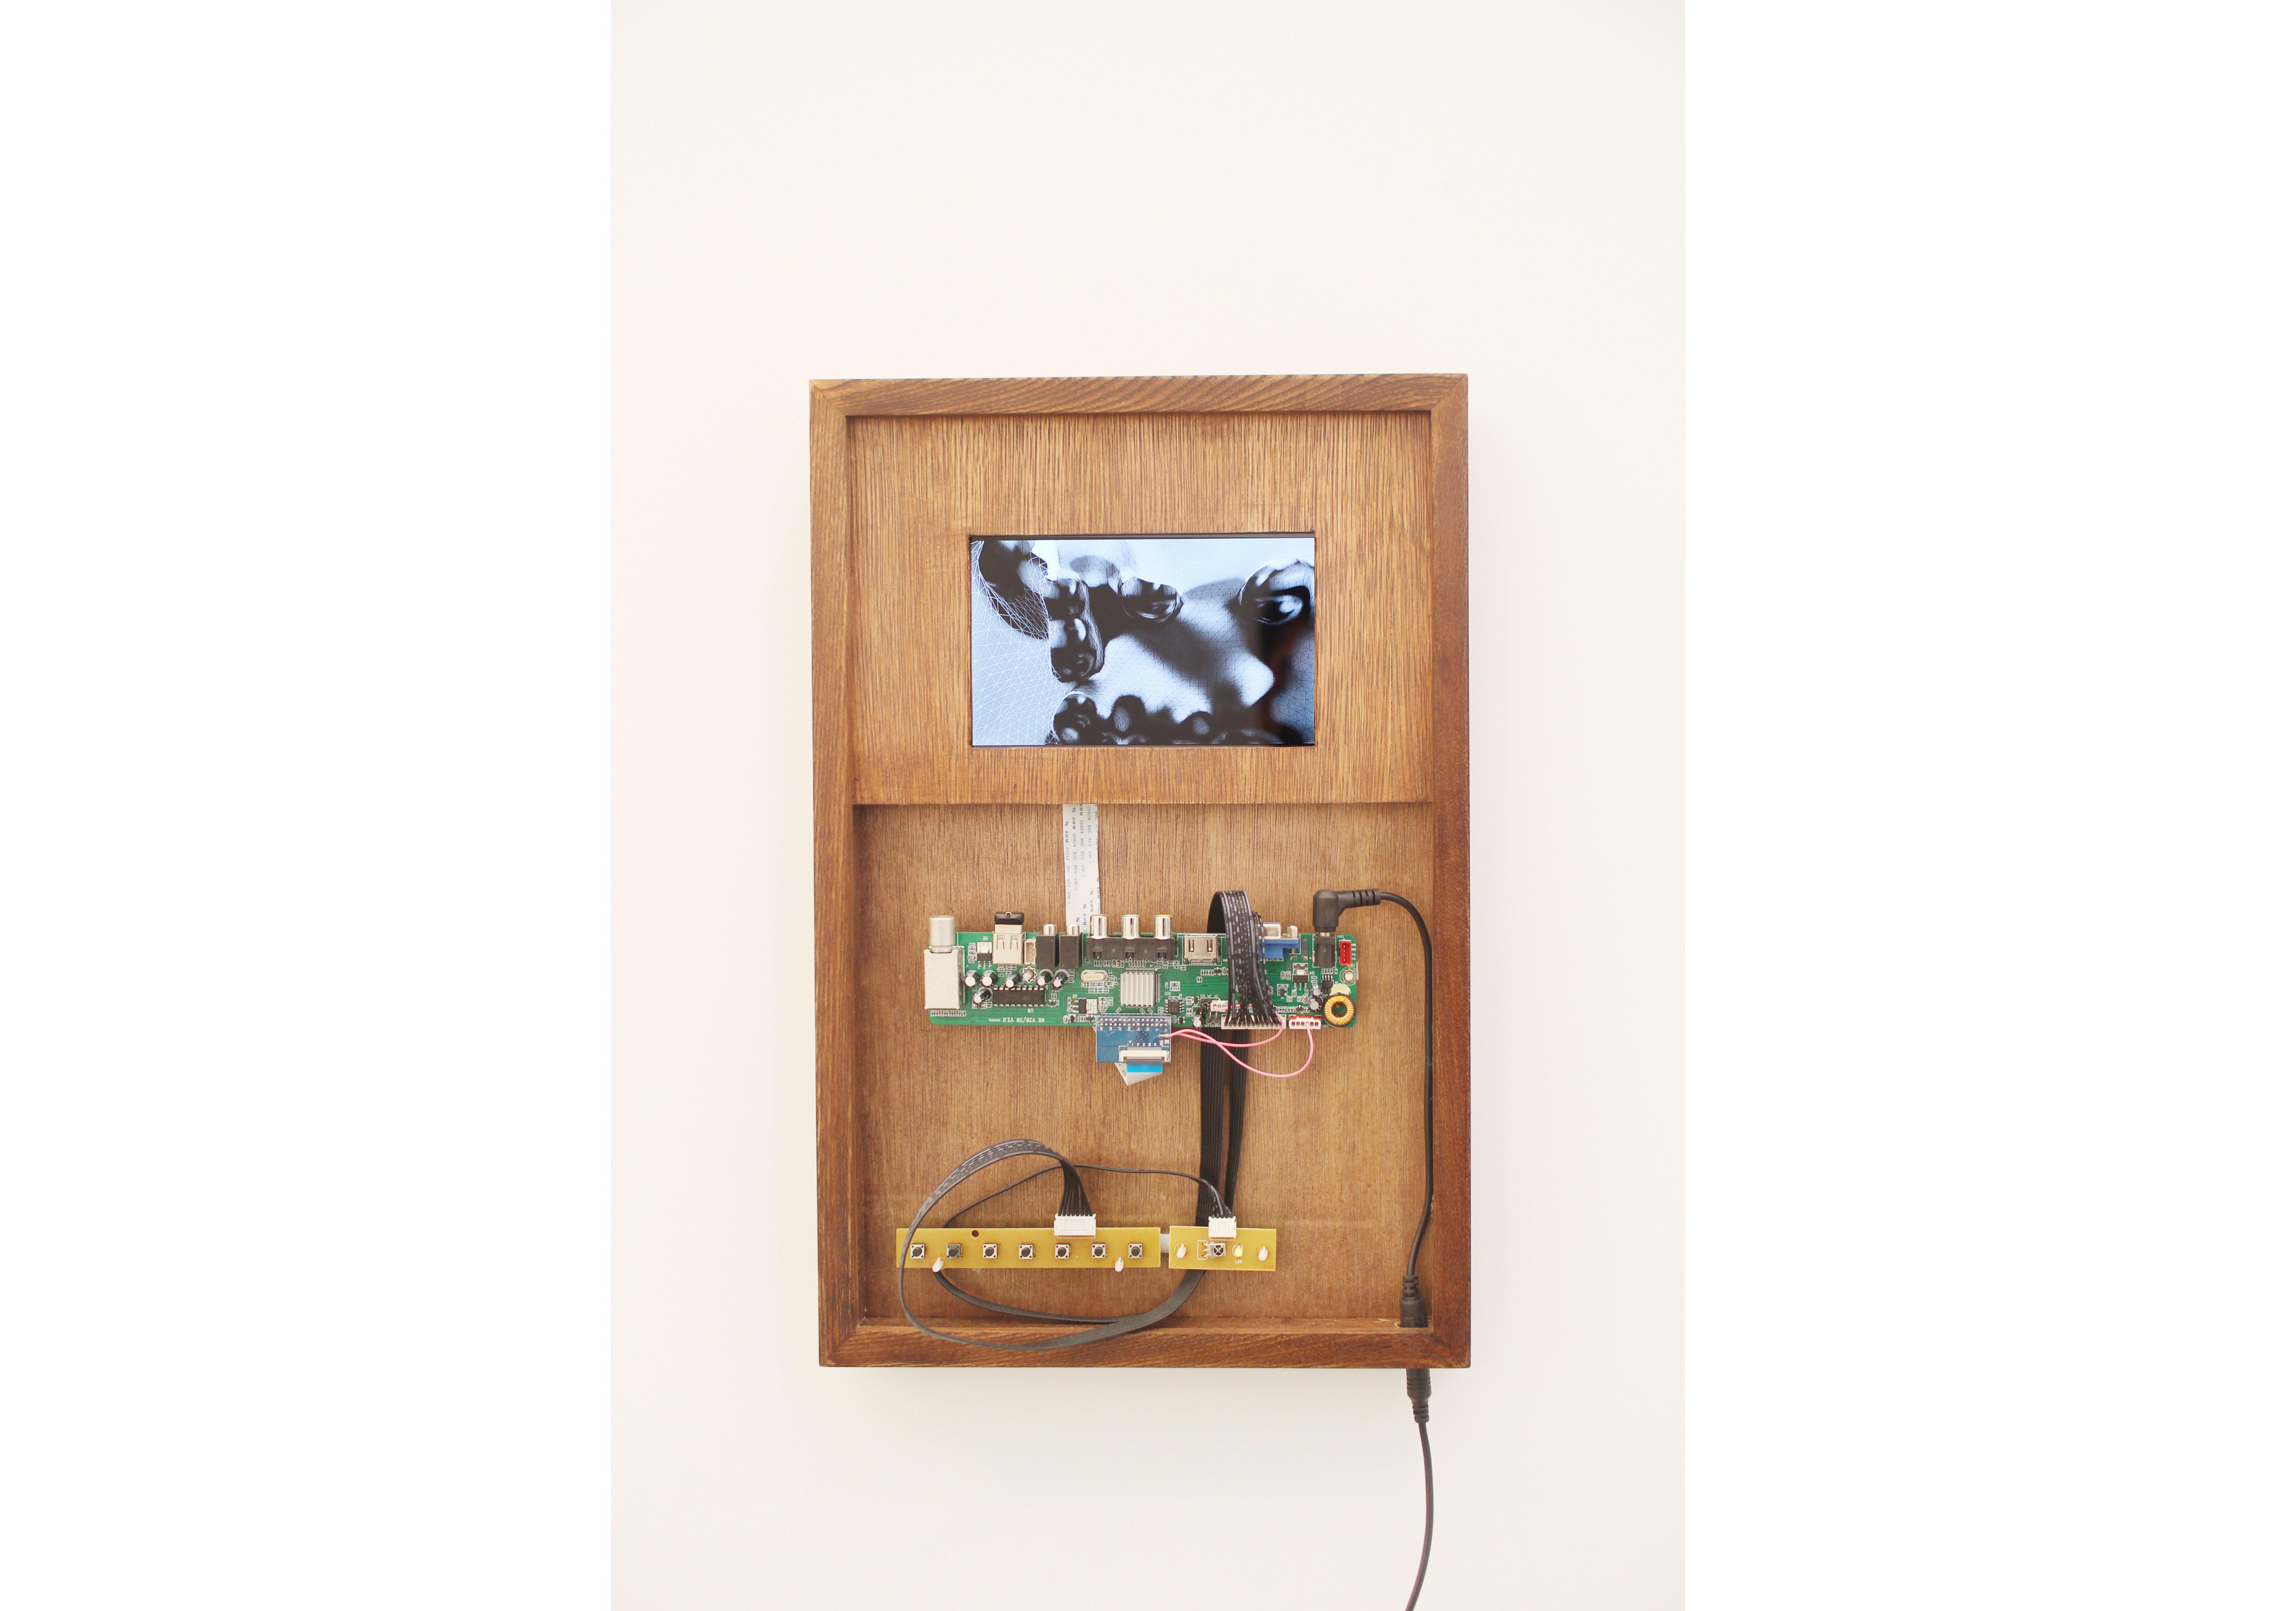 aaajiaoMeta 2013LCD screen, wood frame Electronic component 42.5 x 28 x 4.5 cm